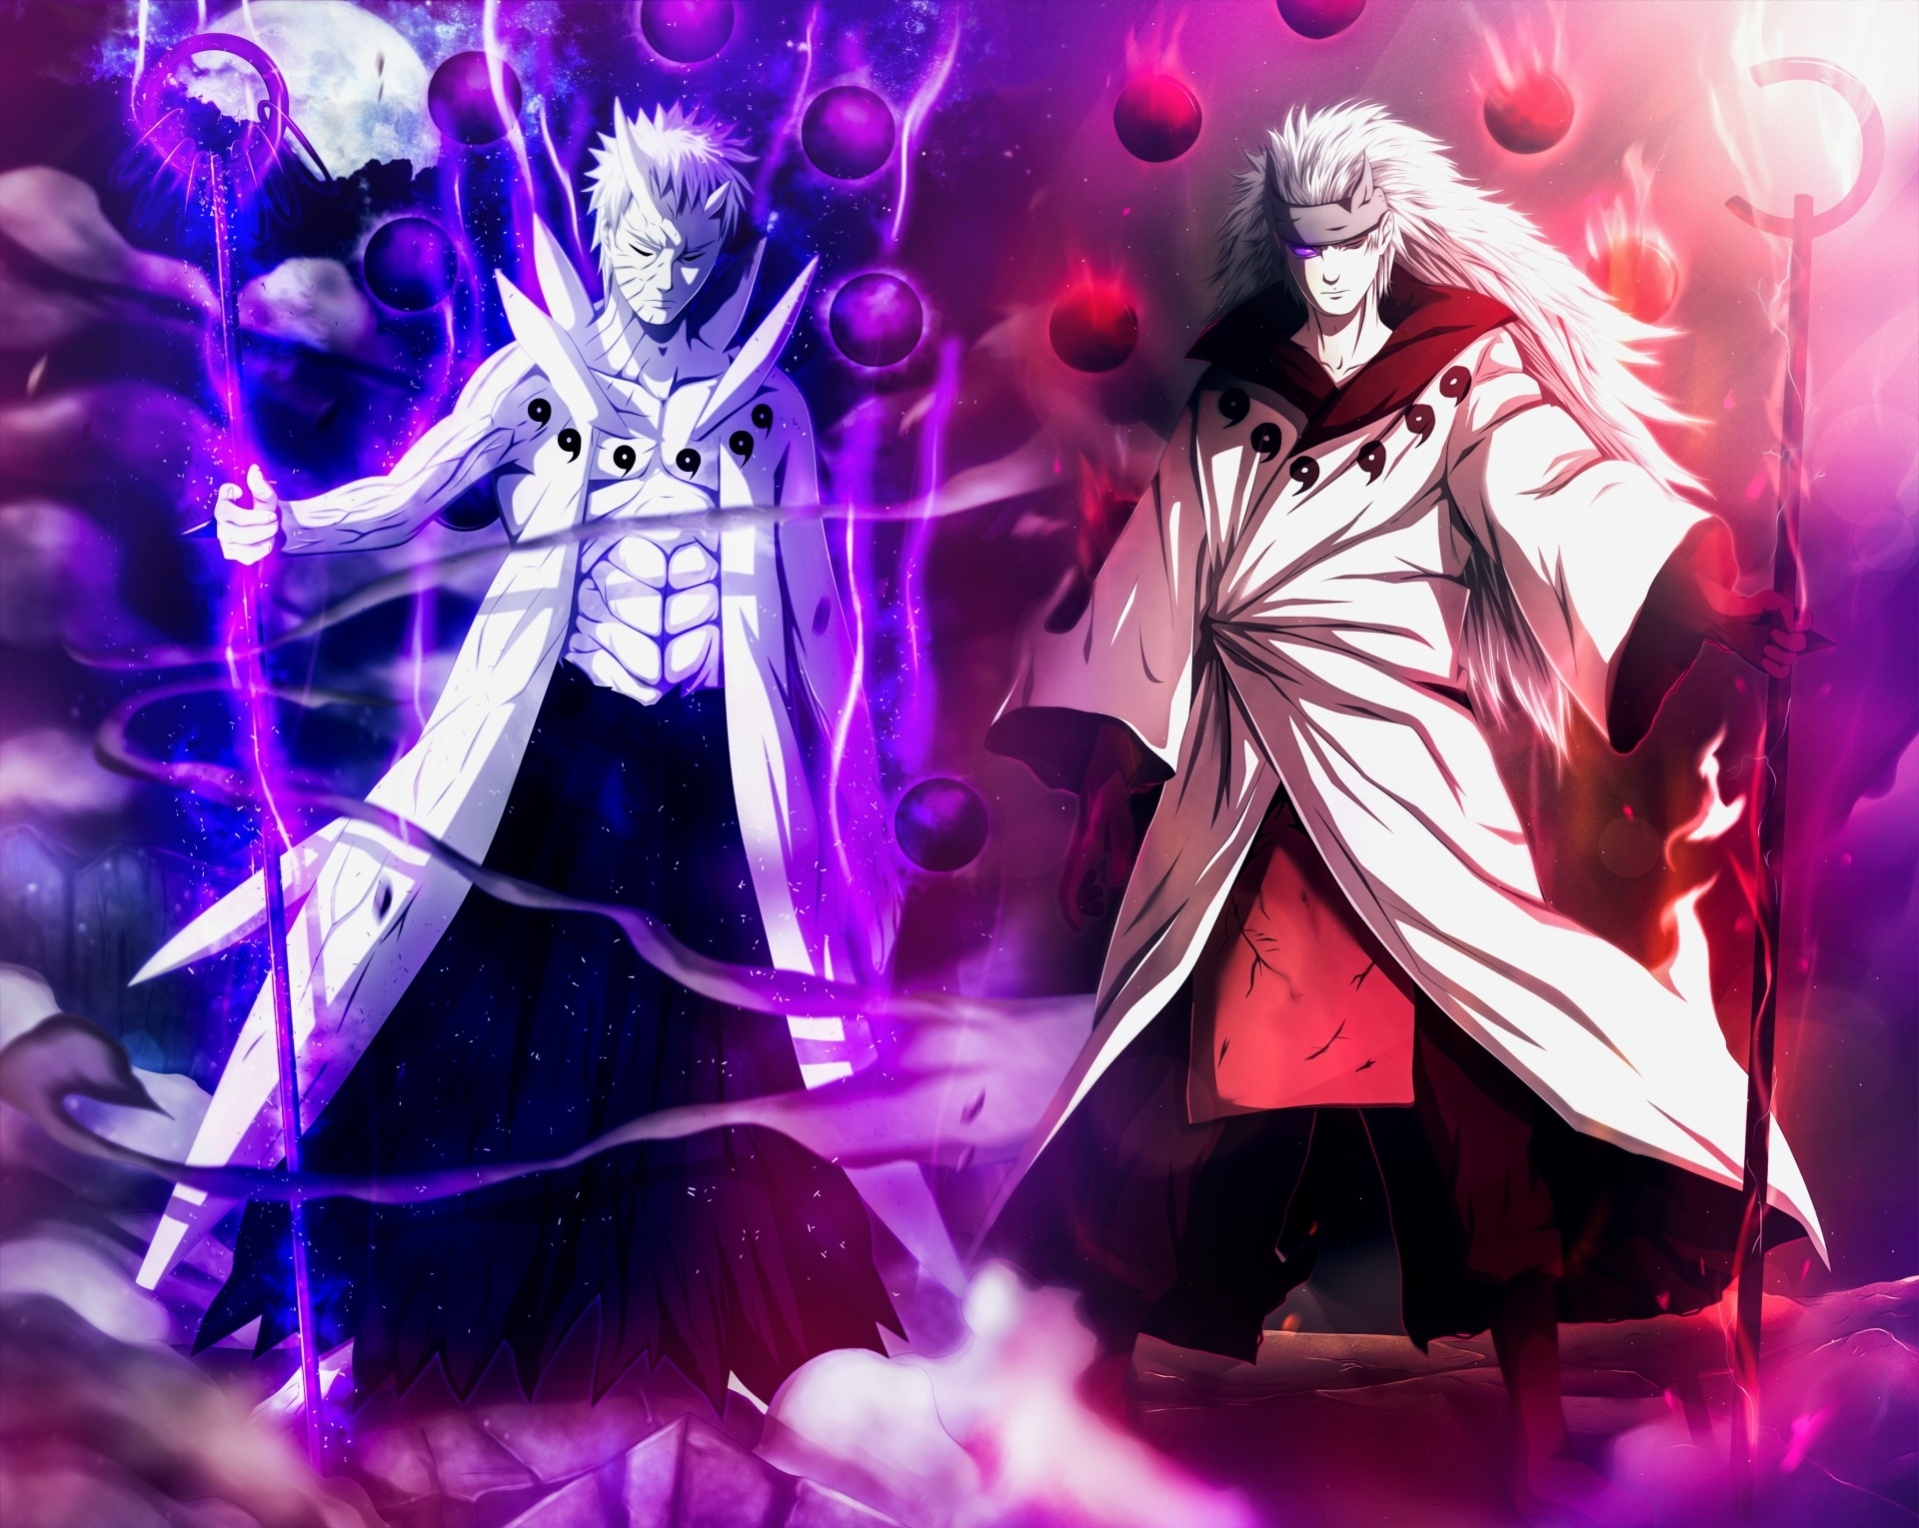 Free HD Anime Wallpaper